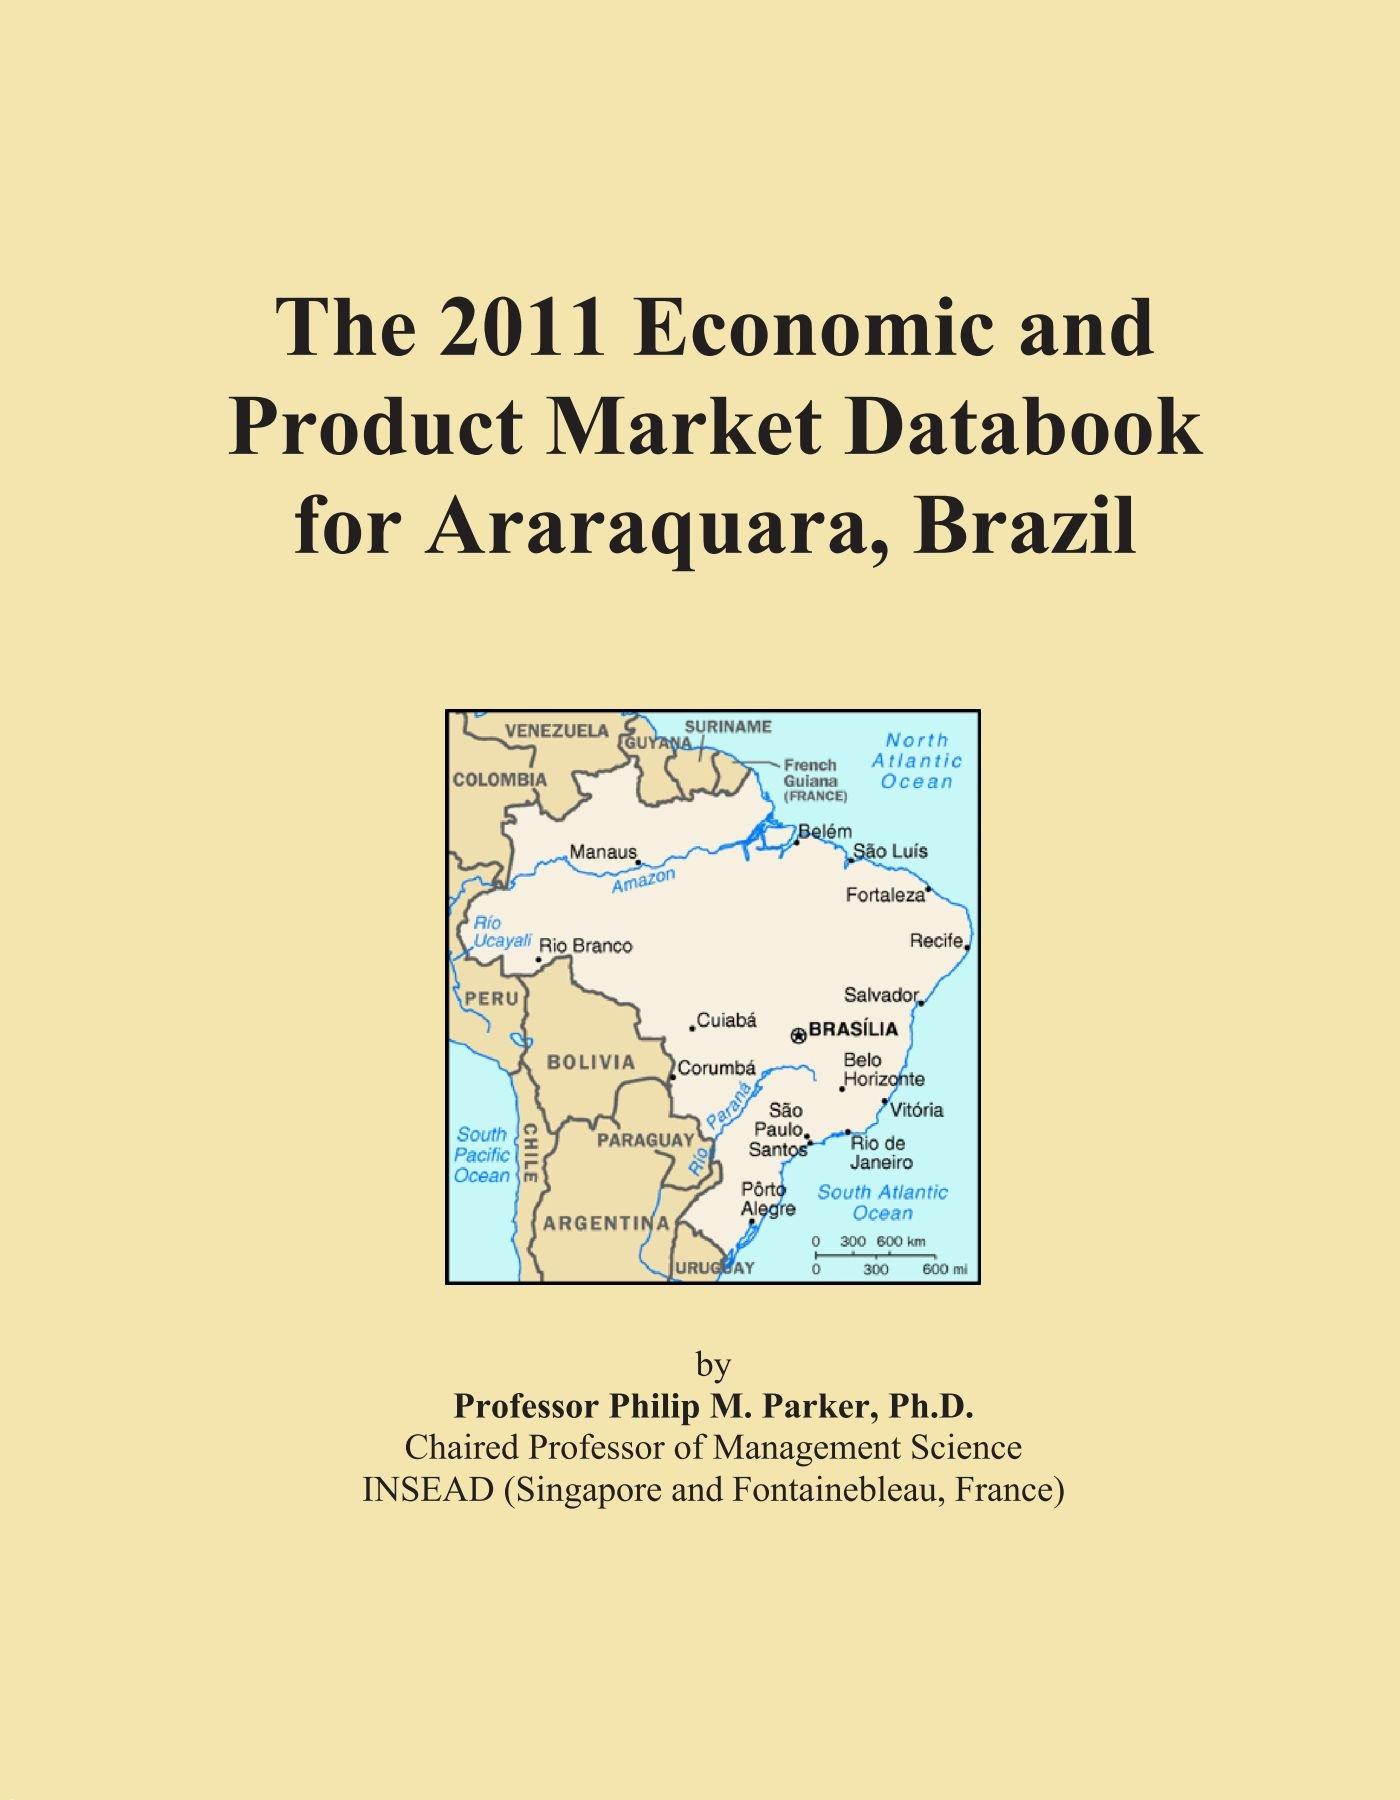 The 2011 Economic and Product Market Databook for Araraquara, Brazil PDF